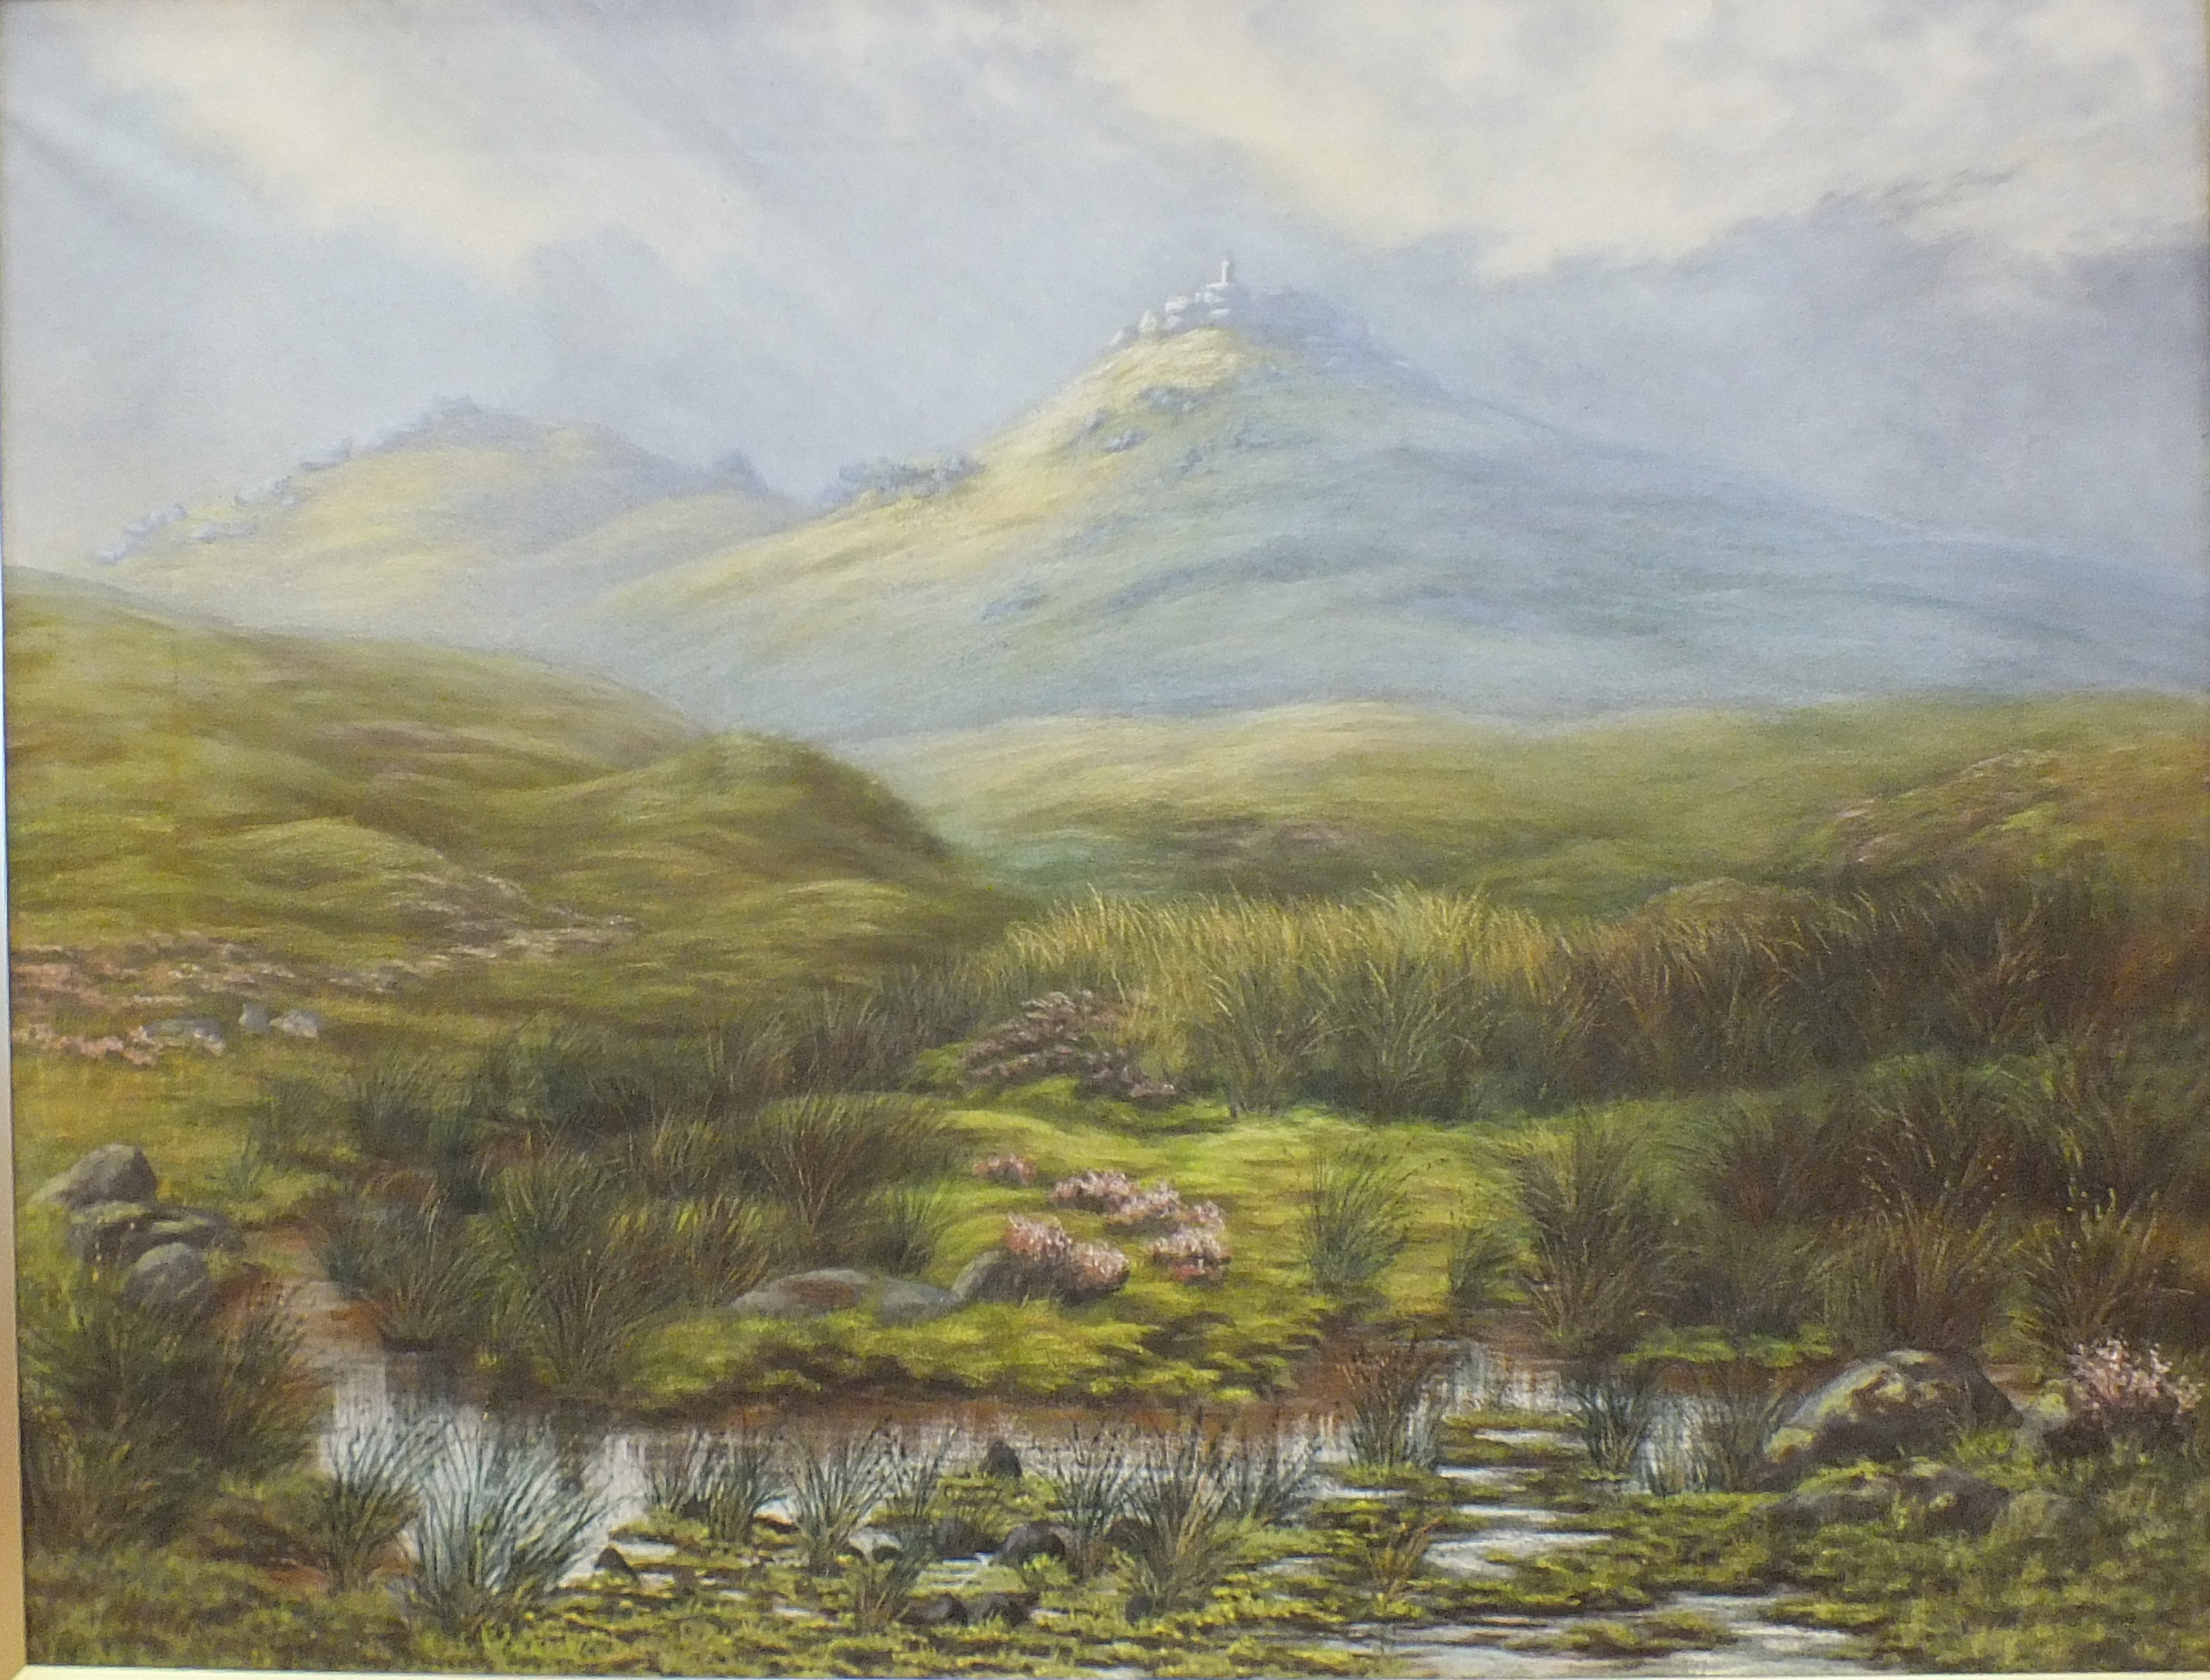 A K Meadows (19th/20th century), 'Looking towards Widgery Cross, Dartmoor', pastel, signed, 60 x - Image 3 of 4